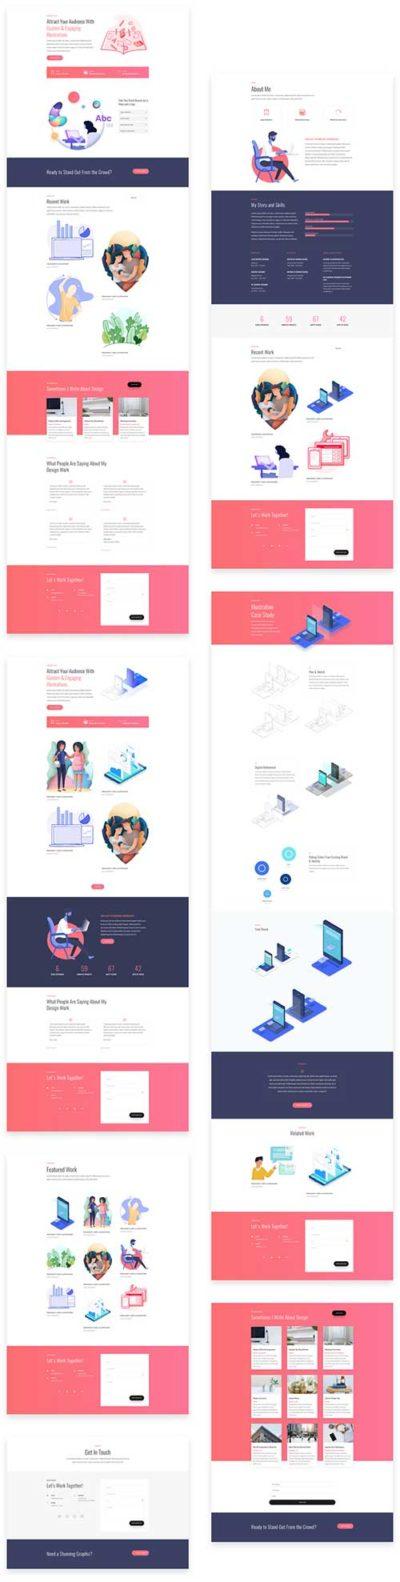 divi layout pack for graphic designer